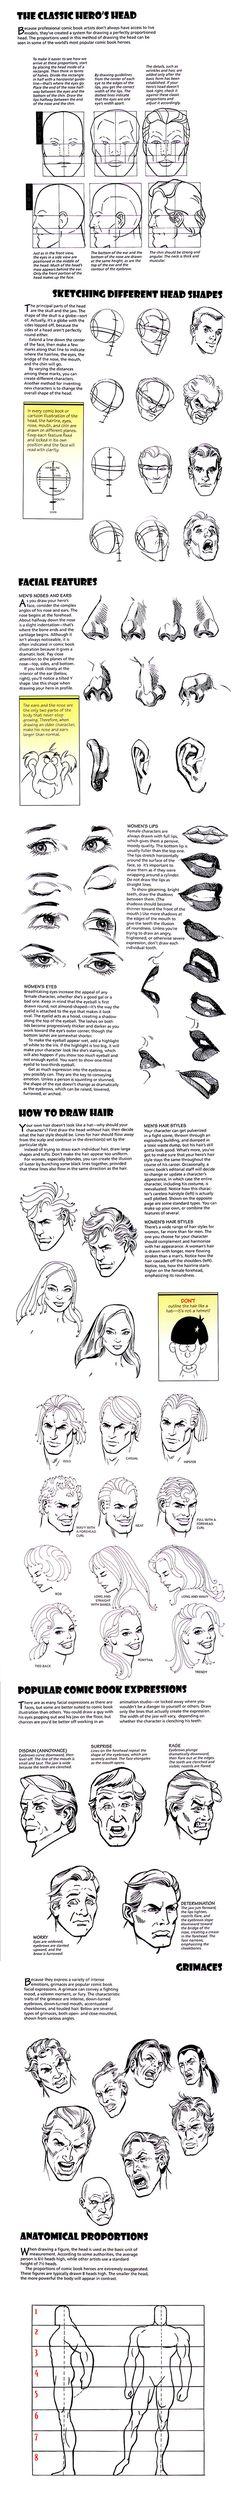 [1] - How to Draw Comics